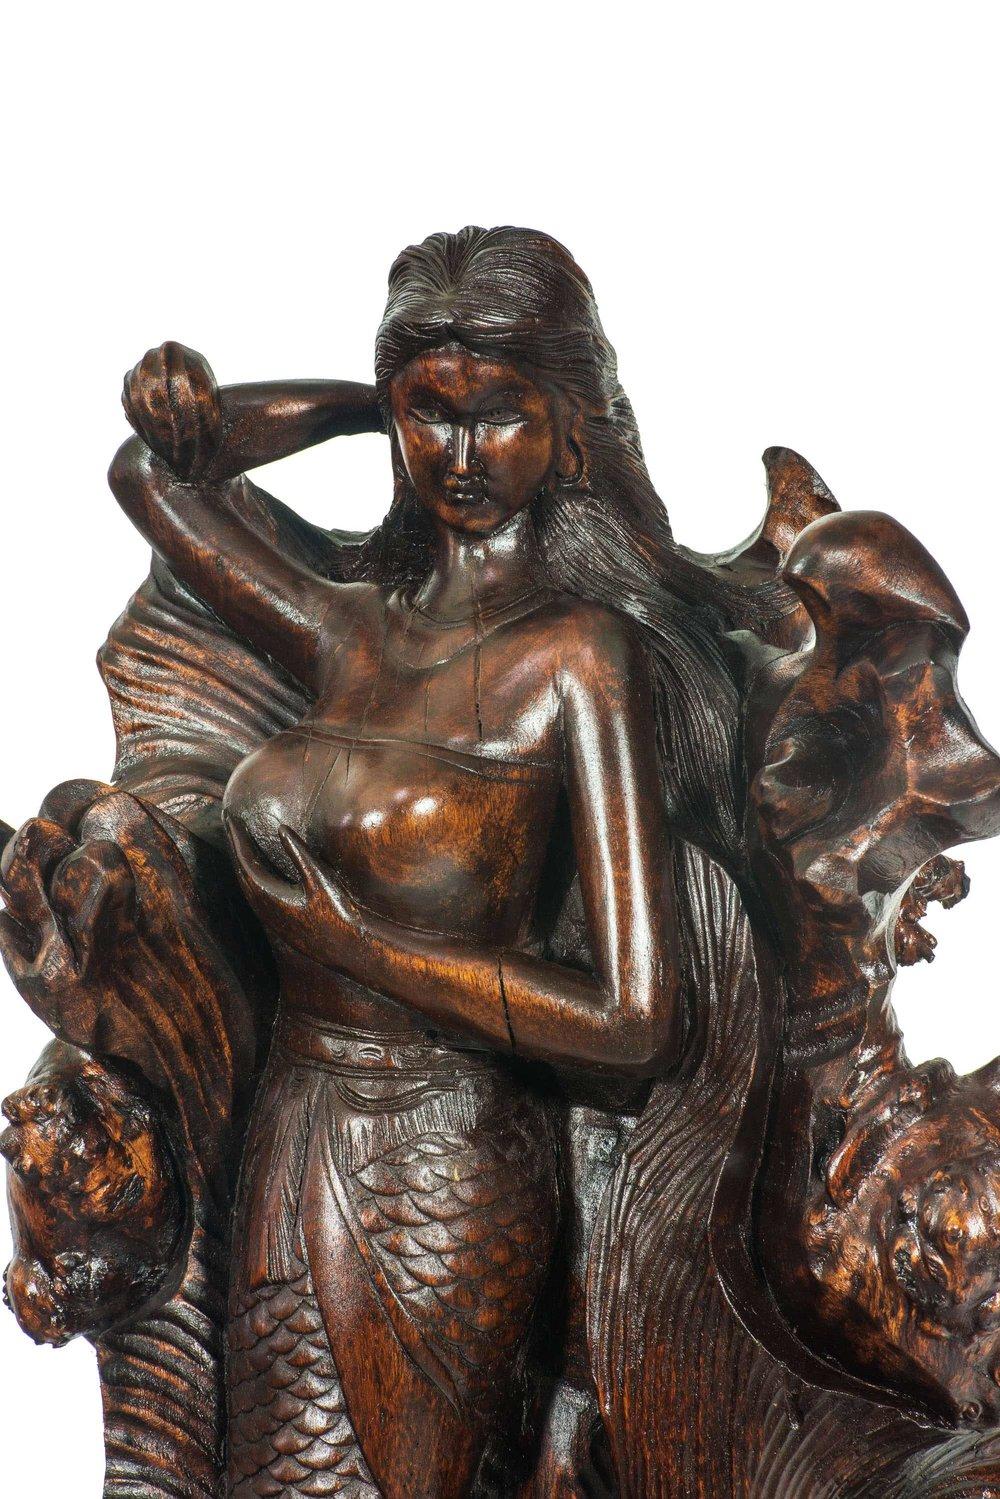 A-Mermaids-Intuition-11_03.jpg